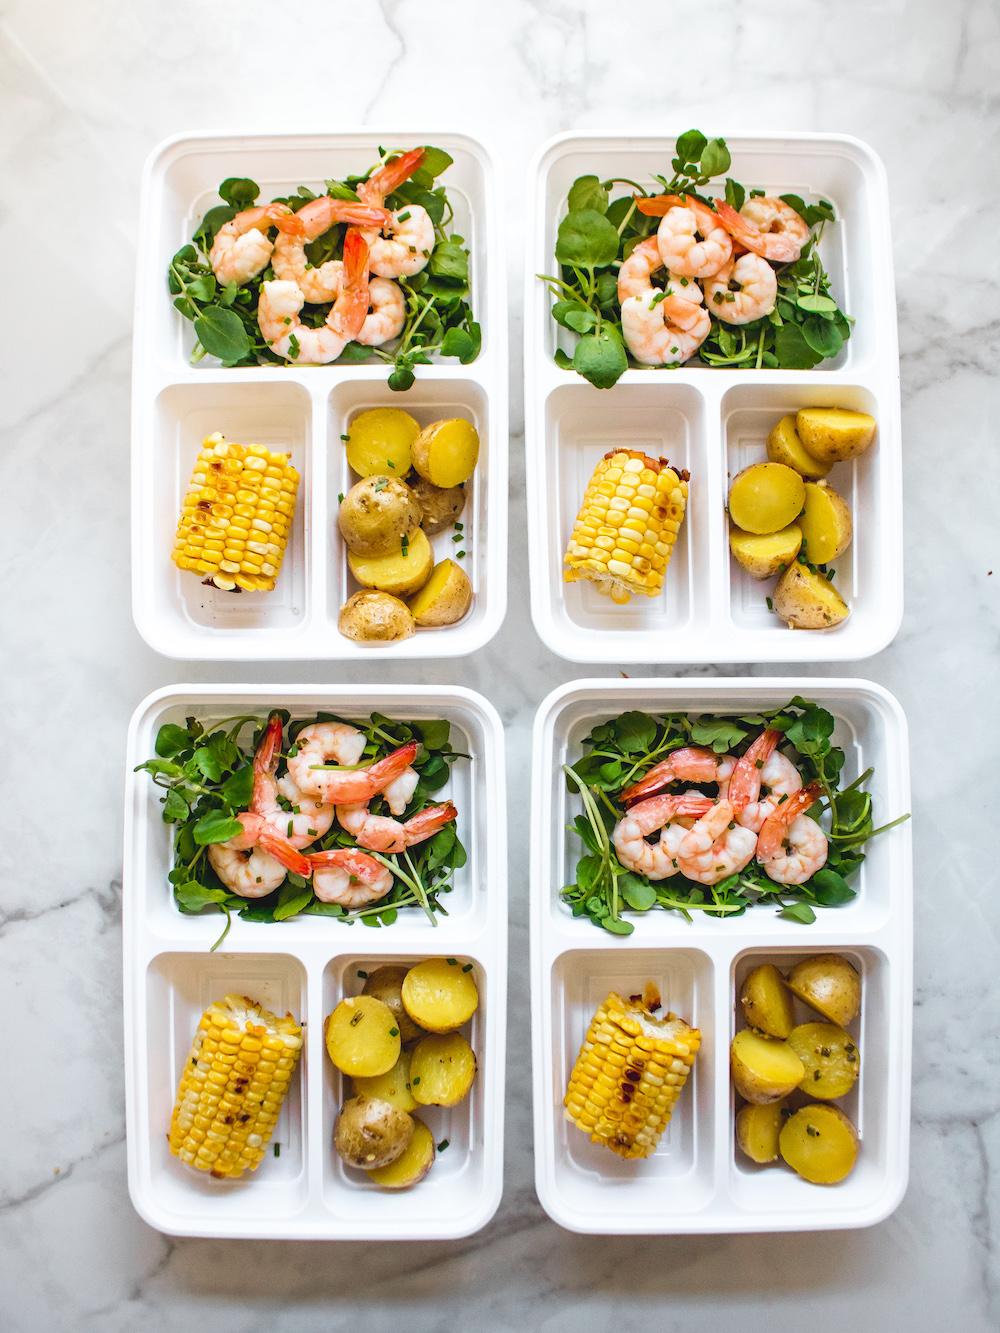 Sheet Pan Butter Herb Shrimp Corn and Potato Bake